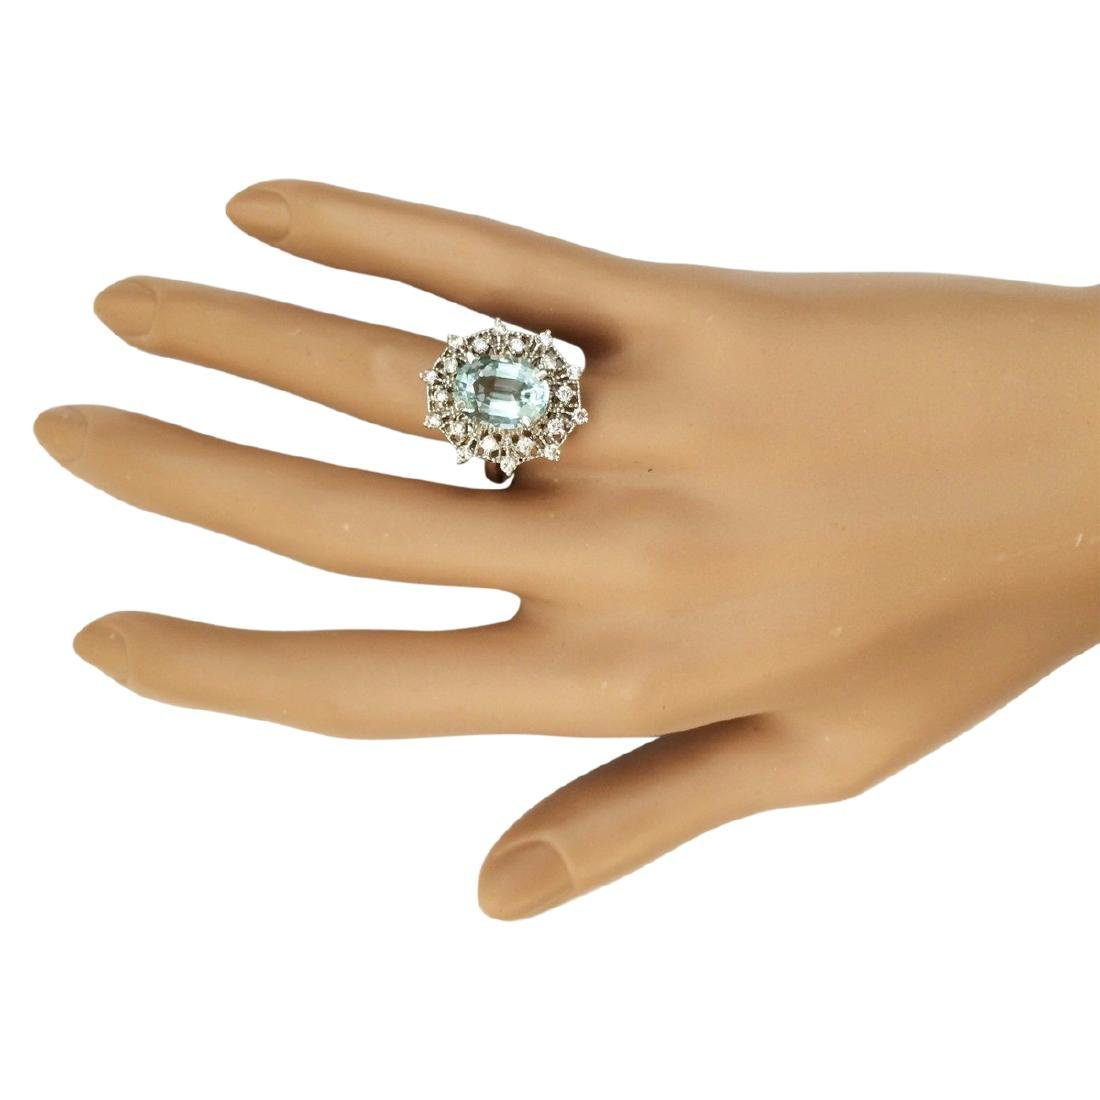 4.32 CTW Natural Aquamarine And Diamond Ring In 18K - 4